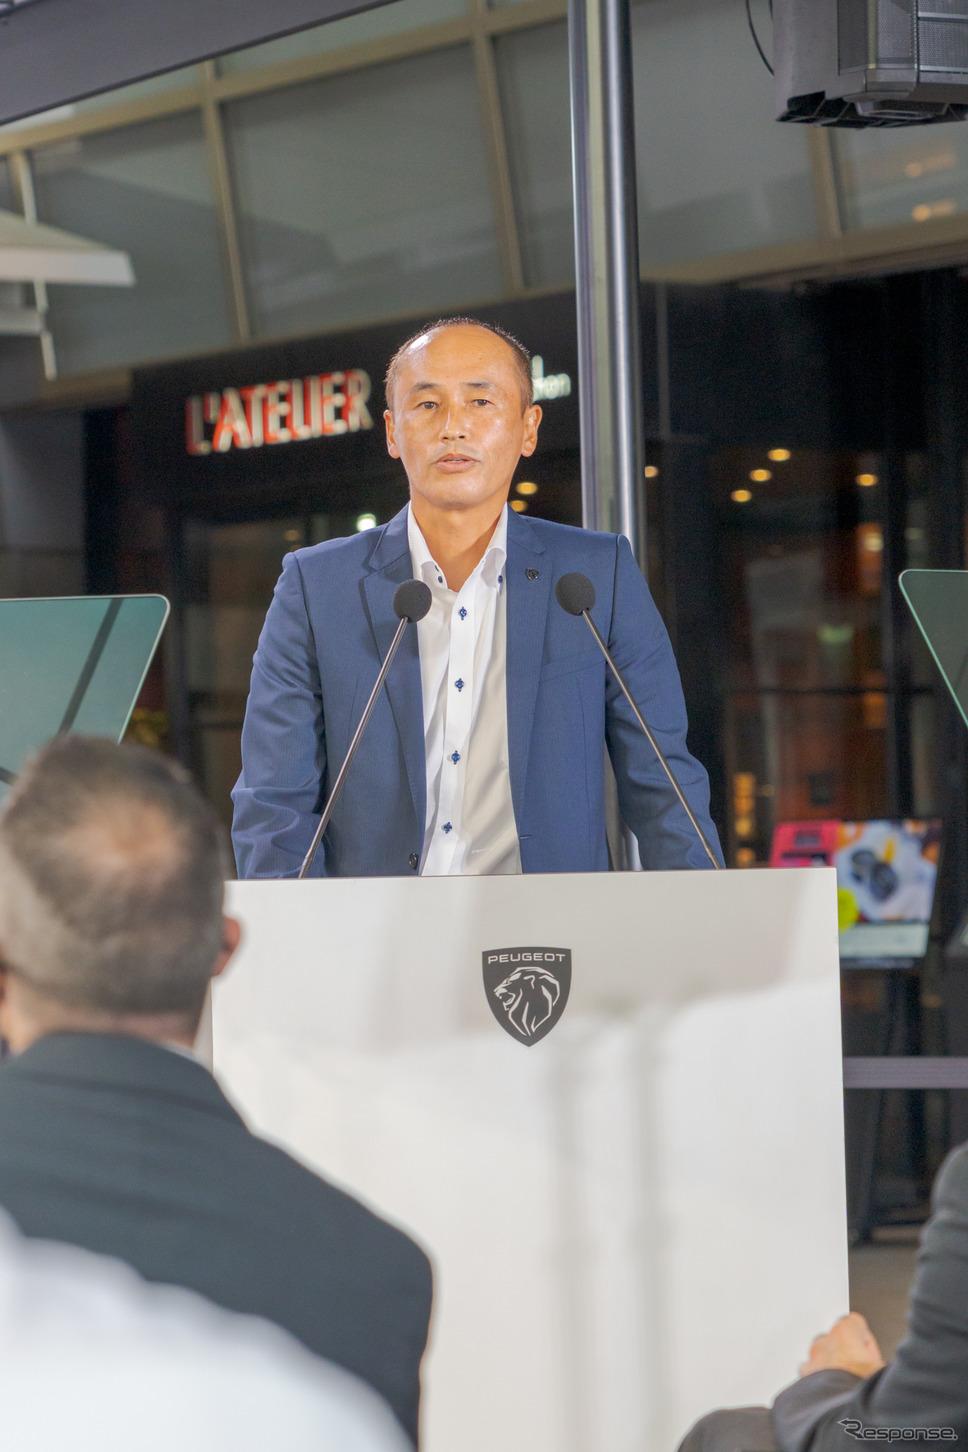 Groupe PSA Japan株式会社マーケティング部プジョープロダクトマネジャーの上村学氏。《写真撮影 関口敬文》